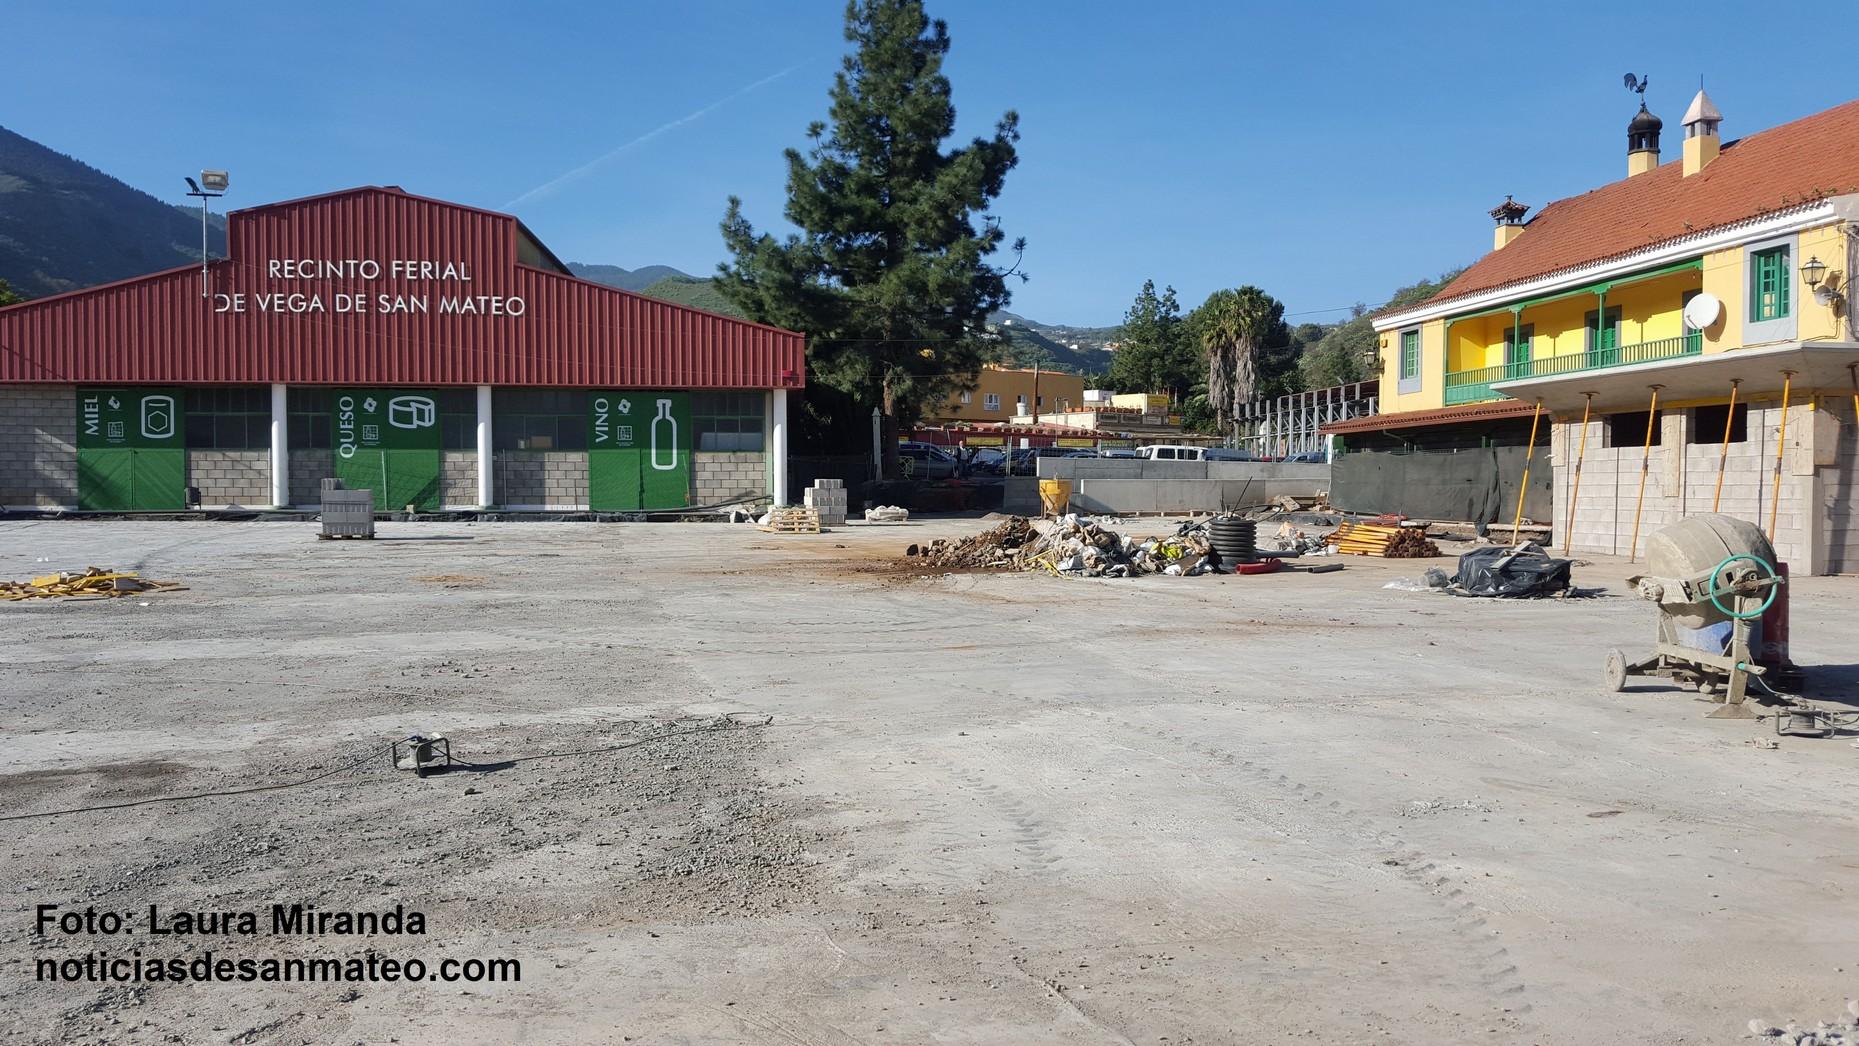 obra mercado avanza 2 14 diciembre de 2015 noticias de san mateo laura miranda